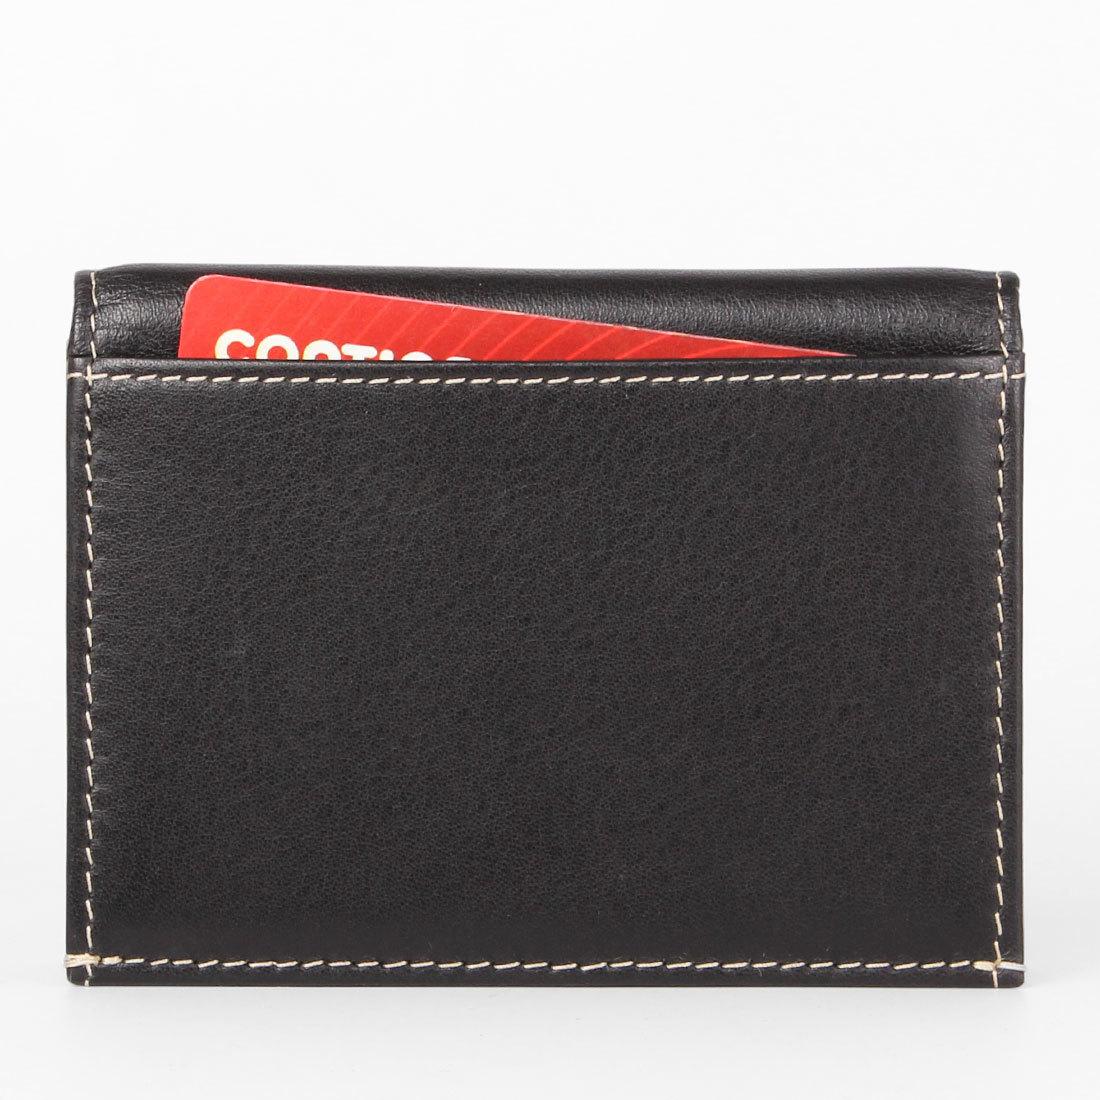 502 R - Футляр для карт и визиток с RFID защитой